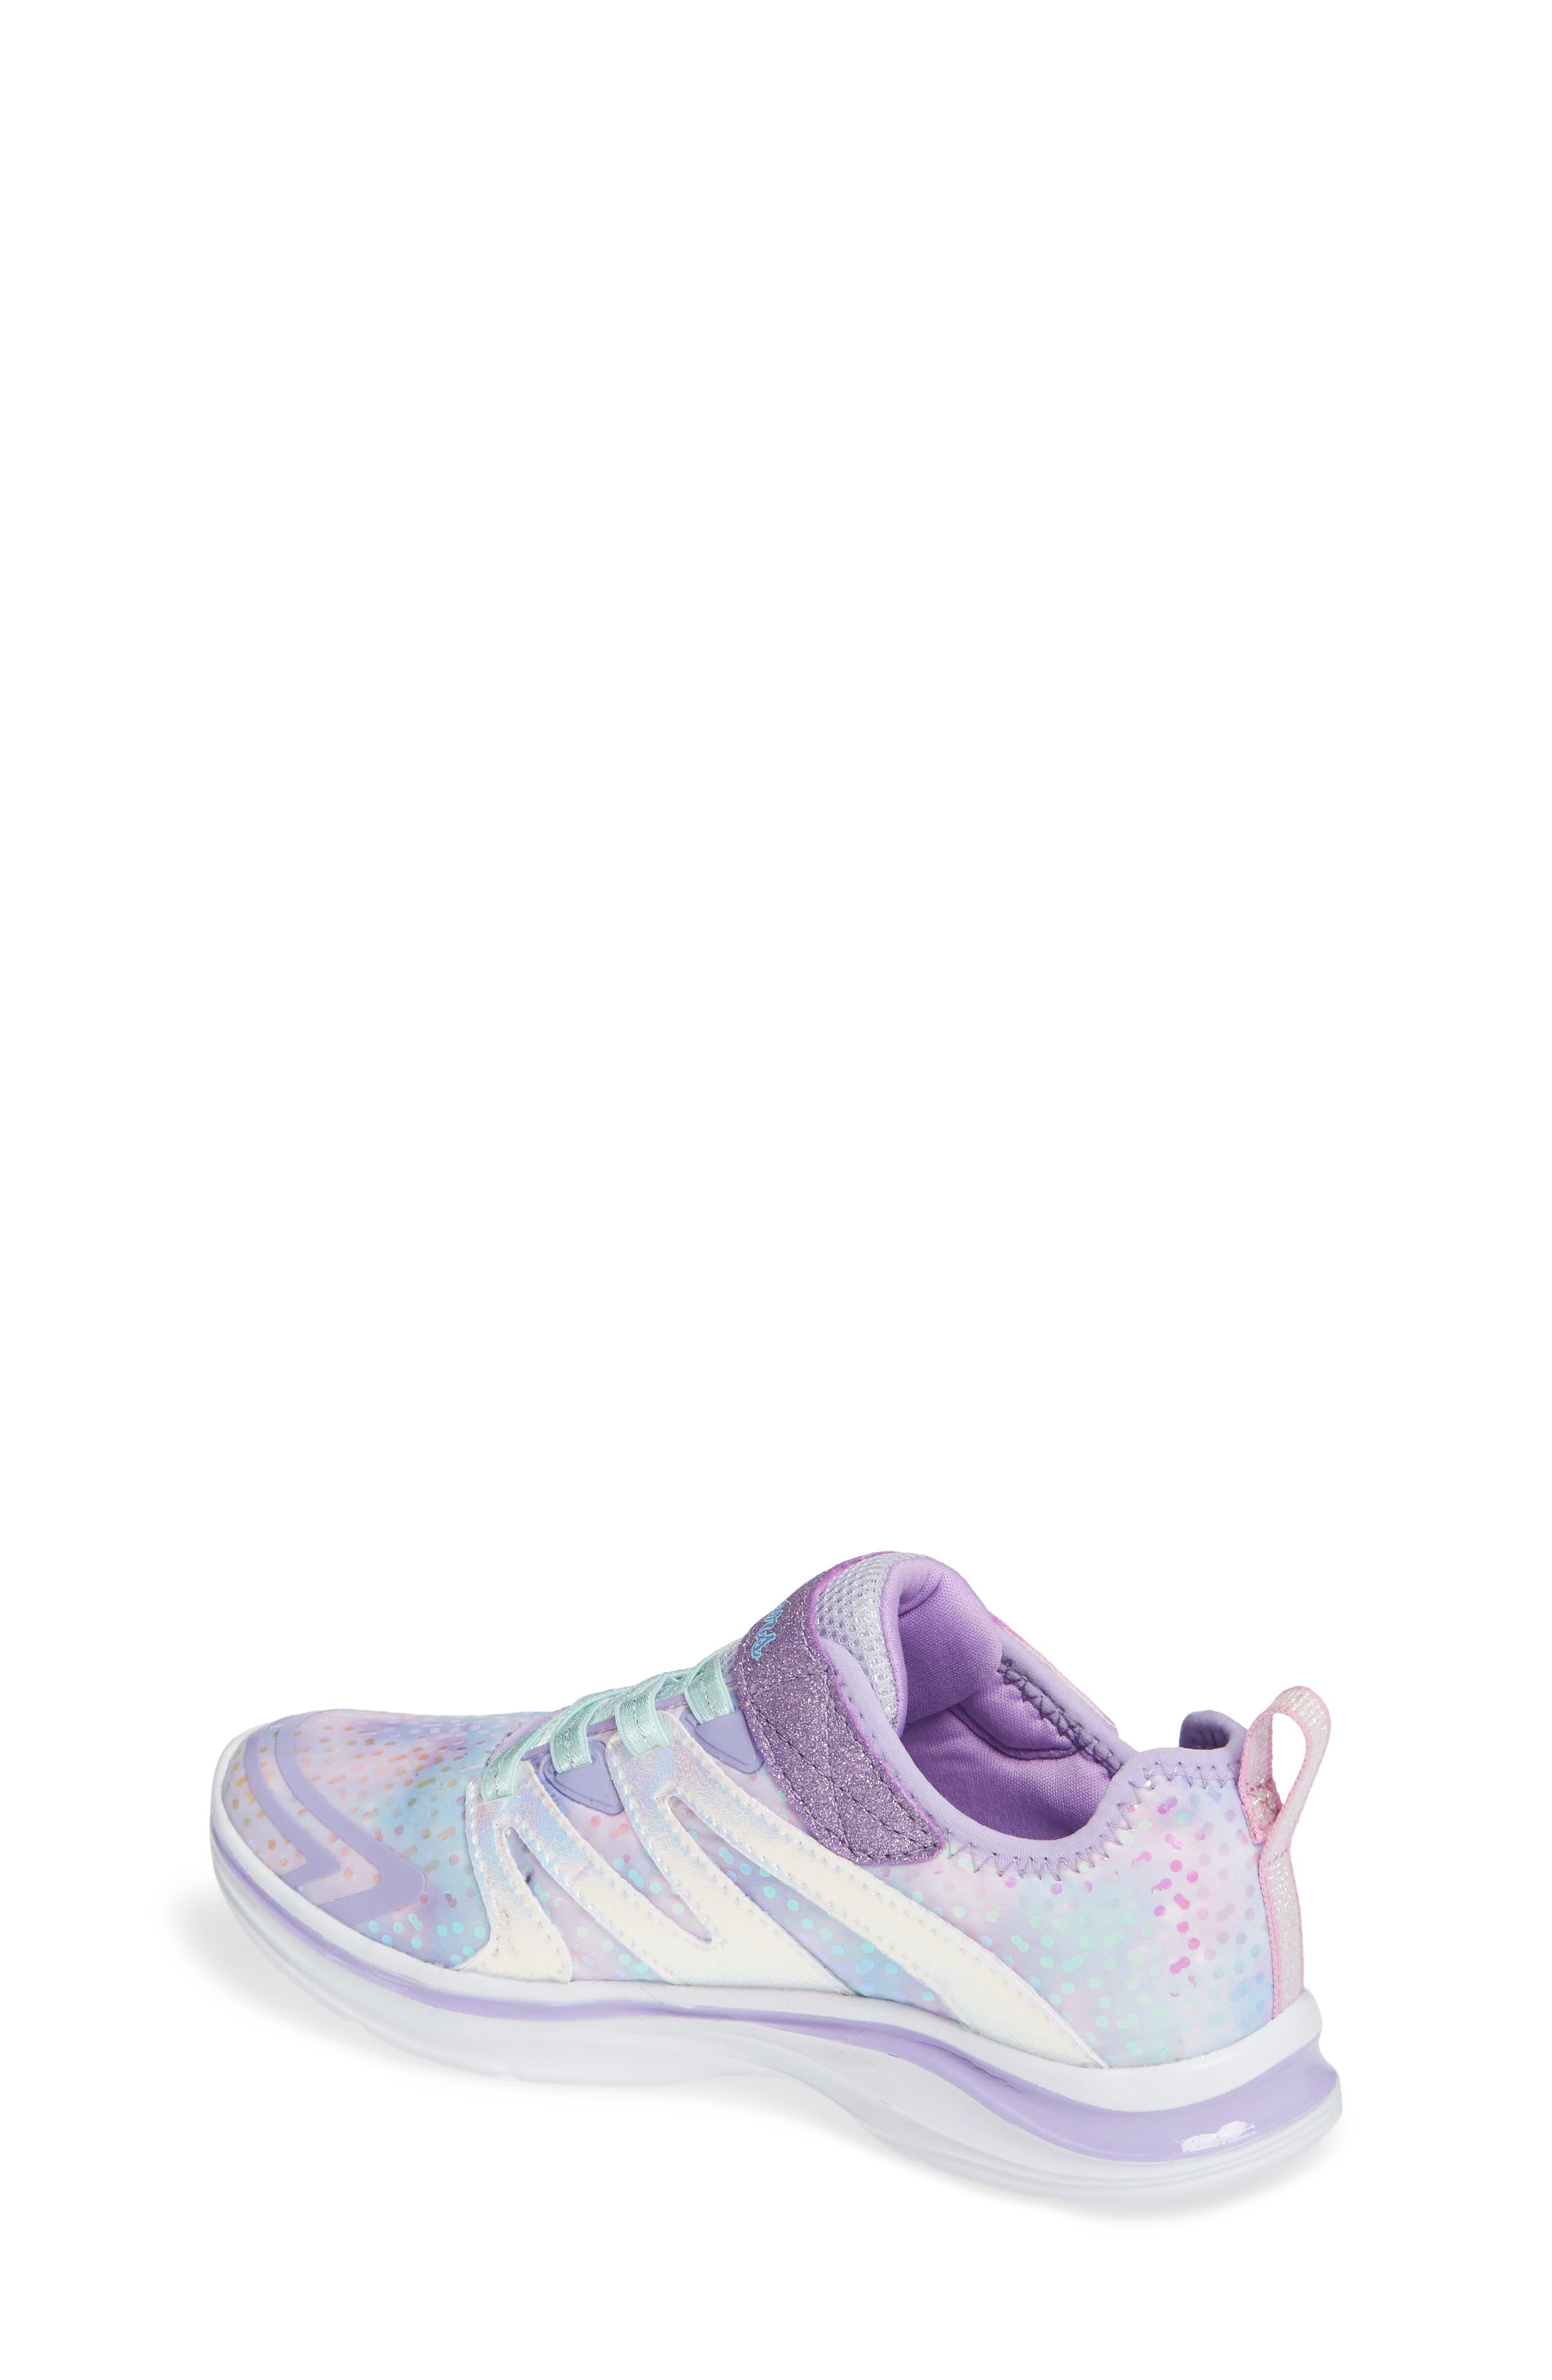 Double Dreams Shimmer Sneaker,                             Alternate thumbnail 2, color,                             LAVENDER/ MULTI